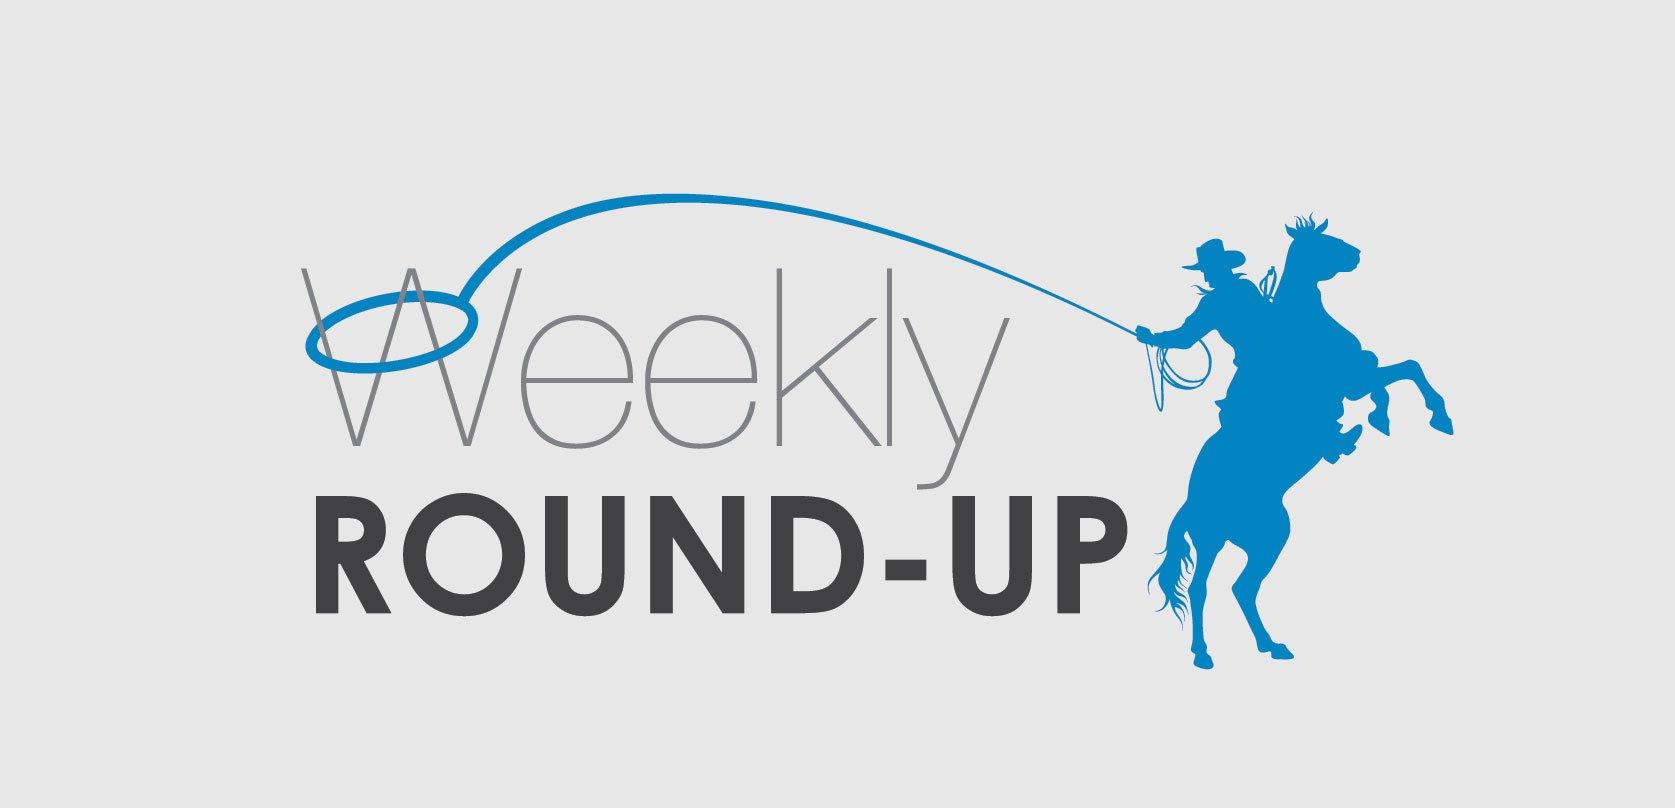 Weekly Round-Up, best blogs, best leadership blogs, the grossman group, david grossman, communication tips